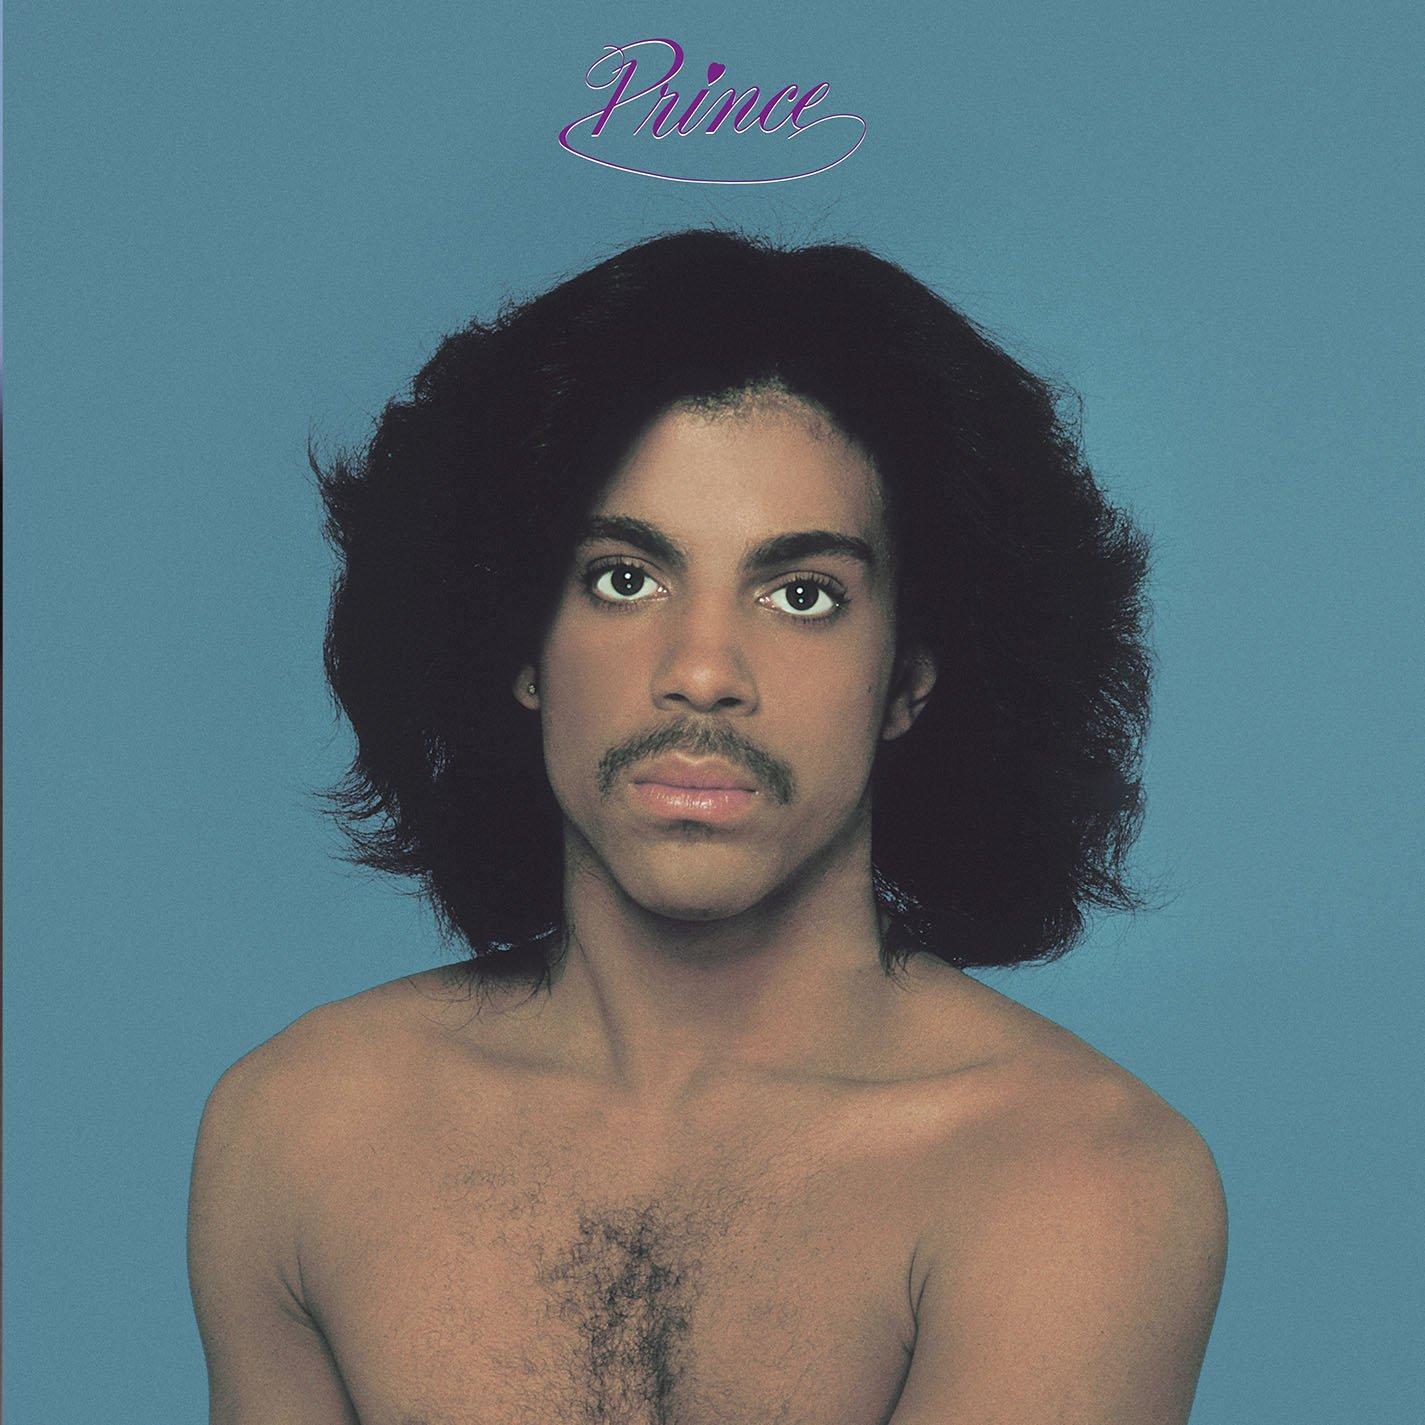 Vinilo : Prince - Prince (LP Vinyl)